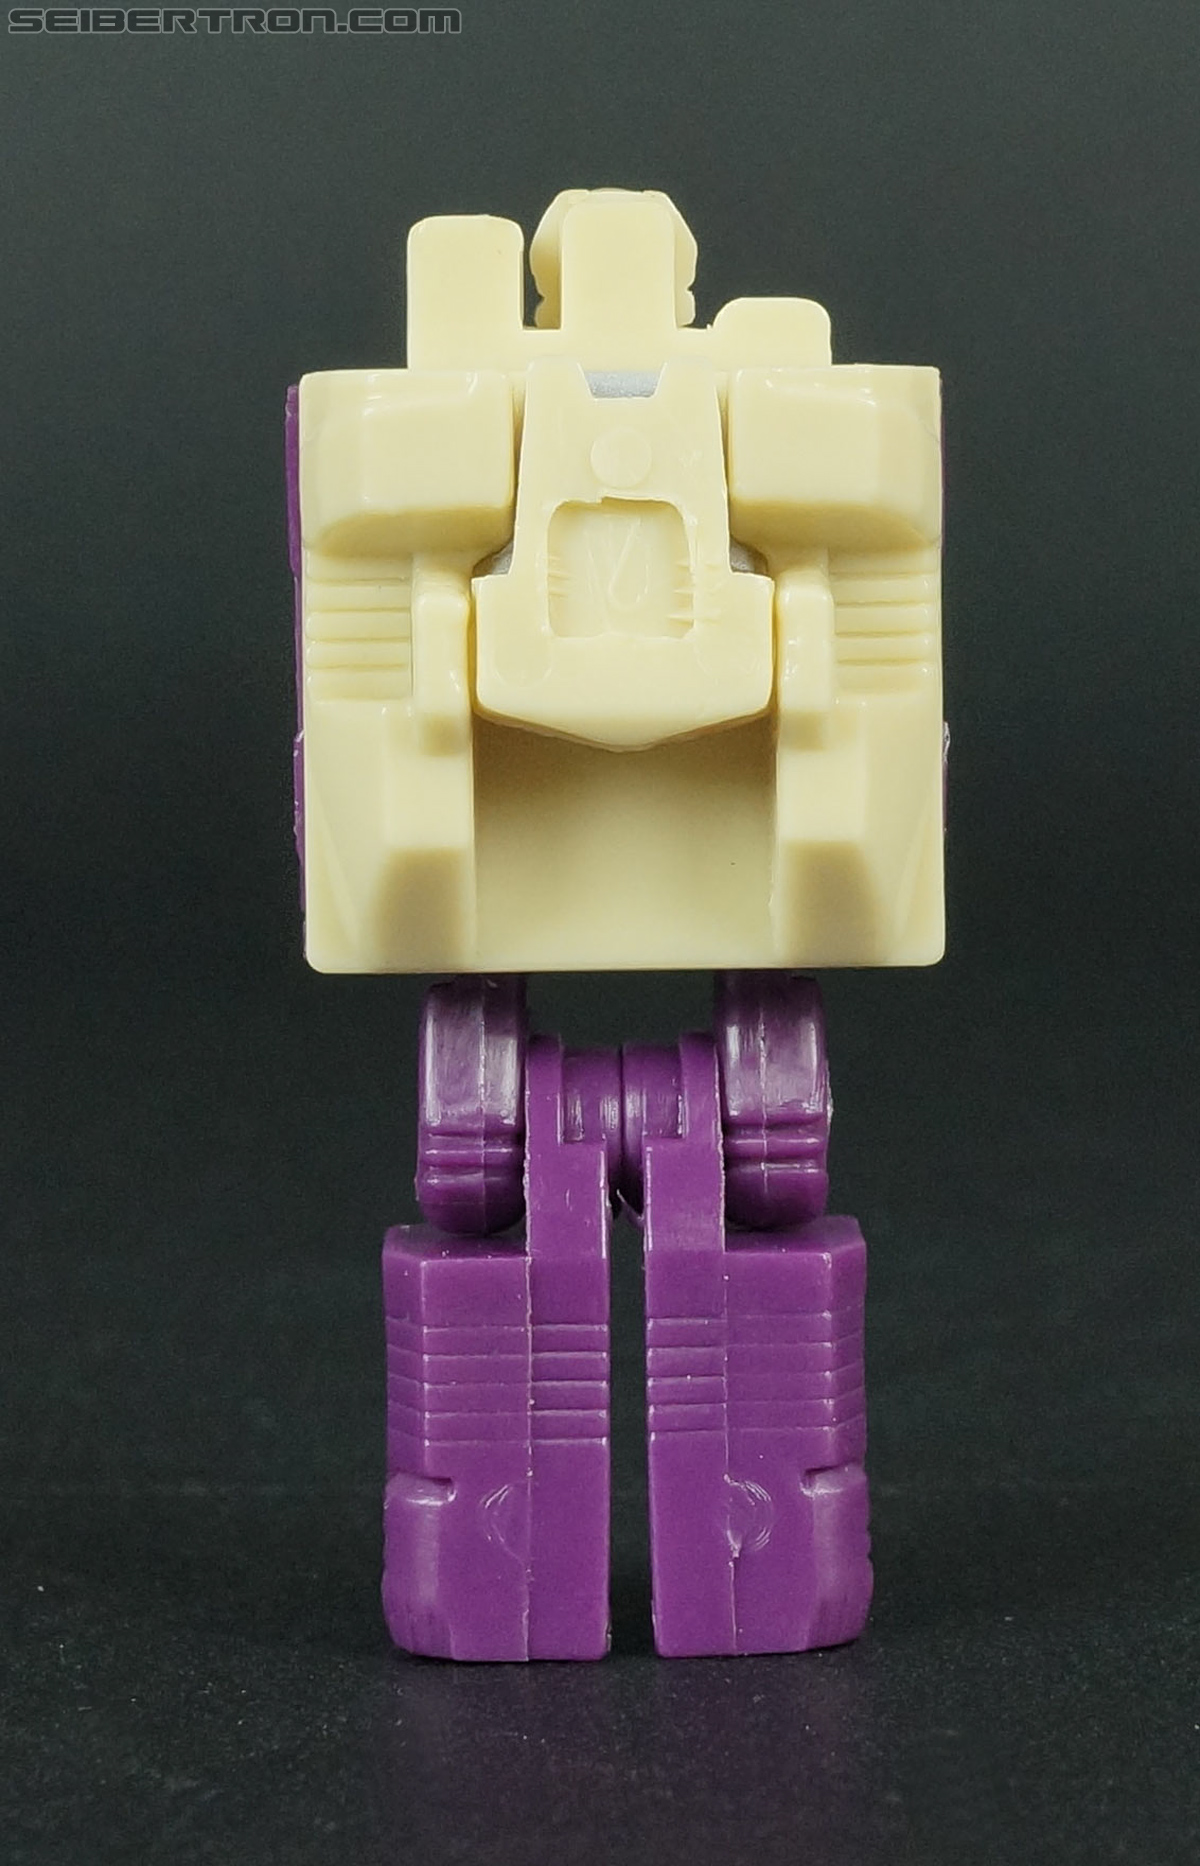 Transformers G1 1987 Lord Zarak (Scorponok) (Image #48 of 116)